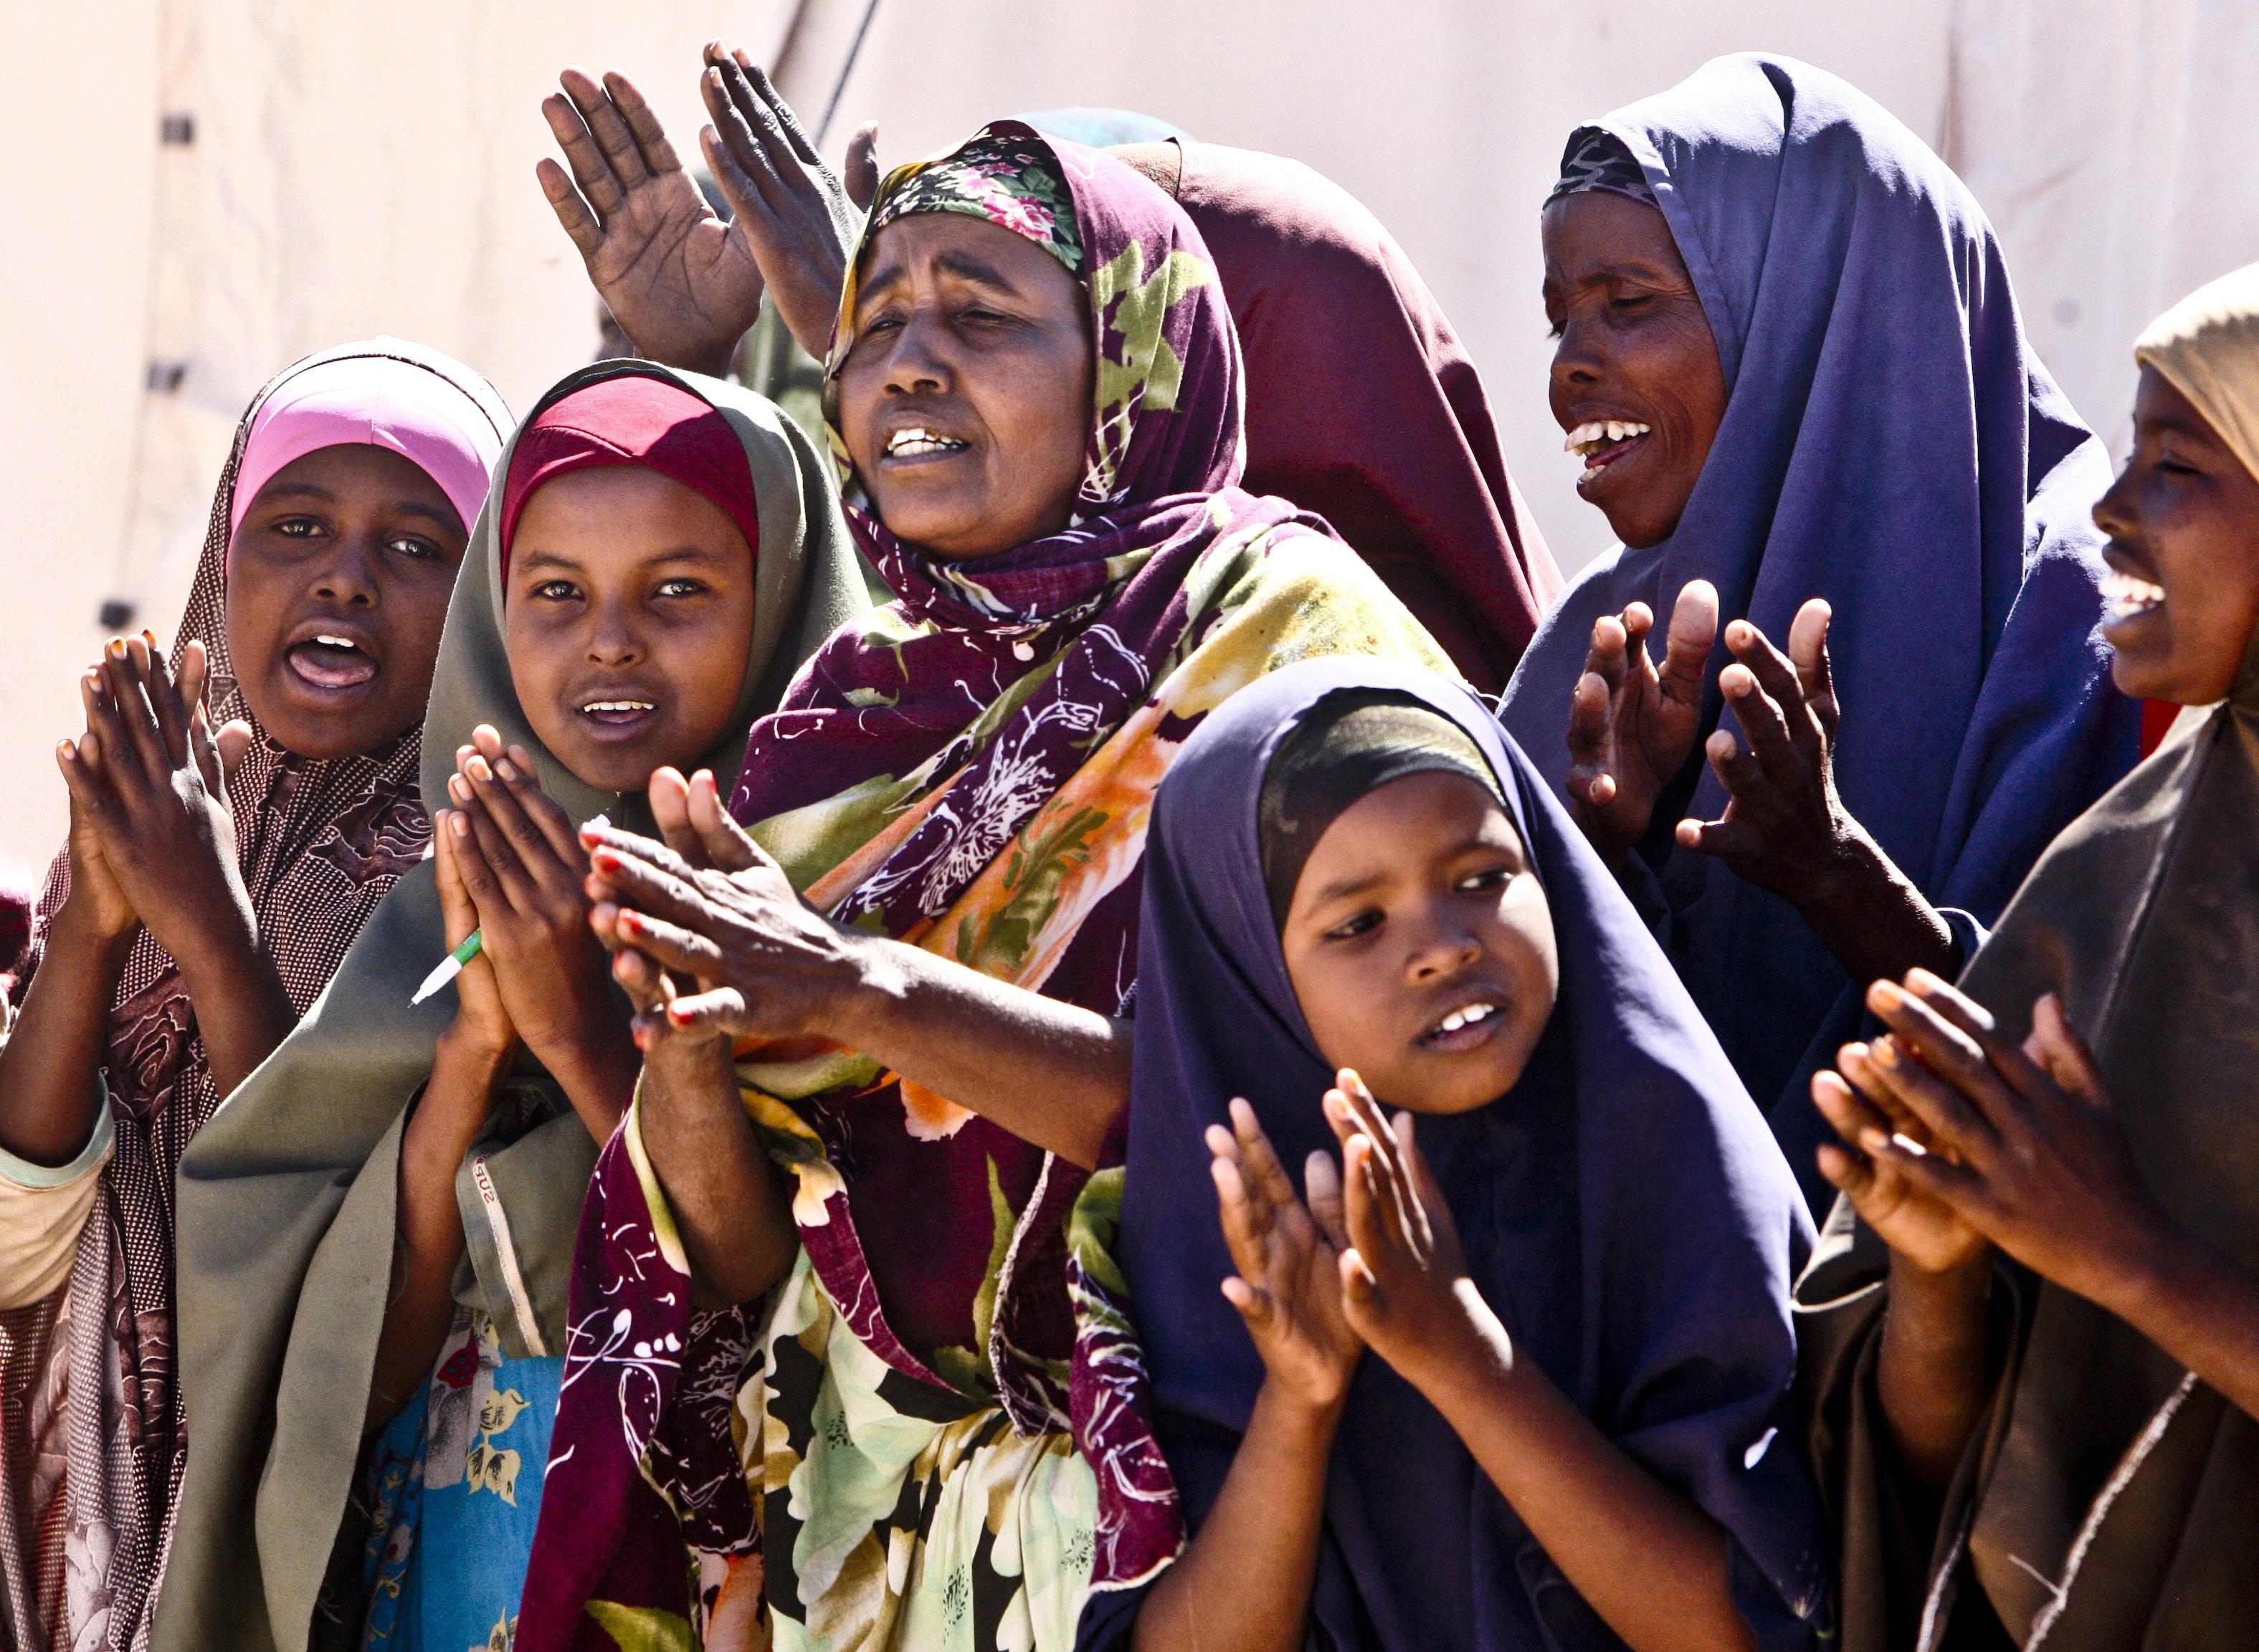 https://i0.wp.com/globalfirstresponder.com/wp-content/gallery/somalia/idpsgreetusg-somalia.jpg